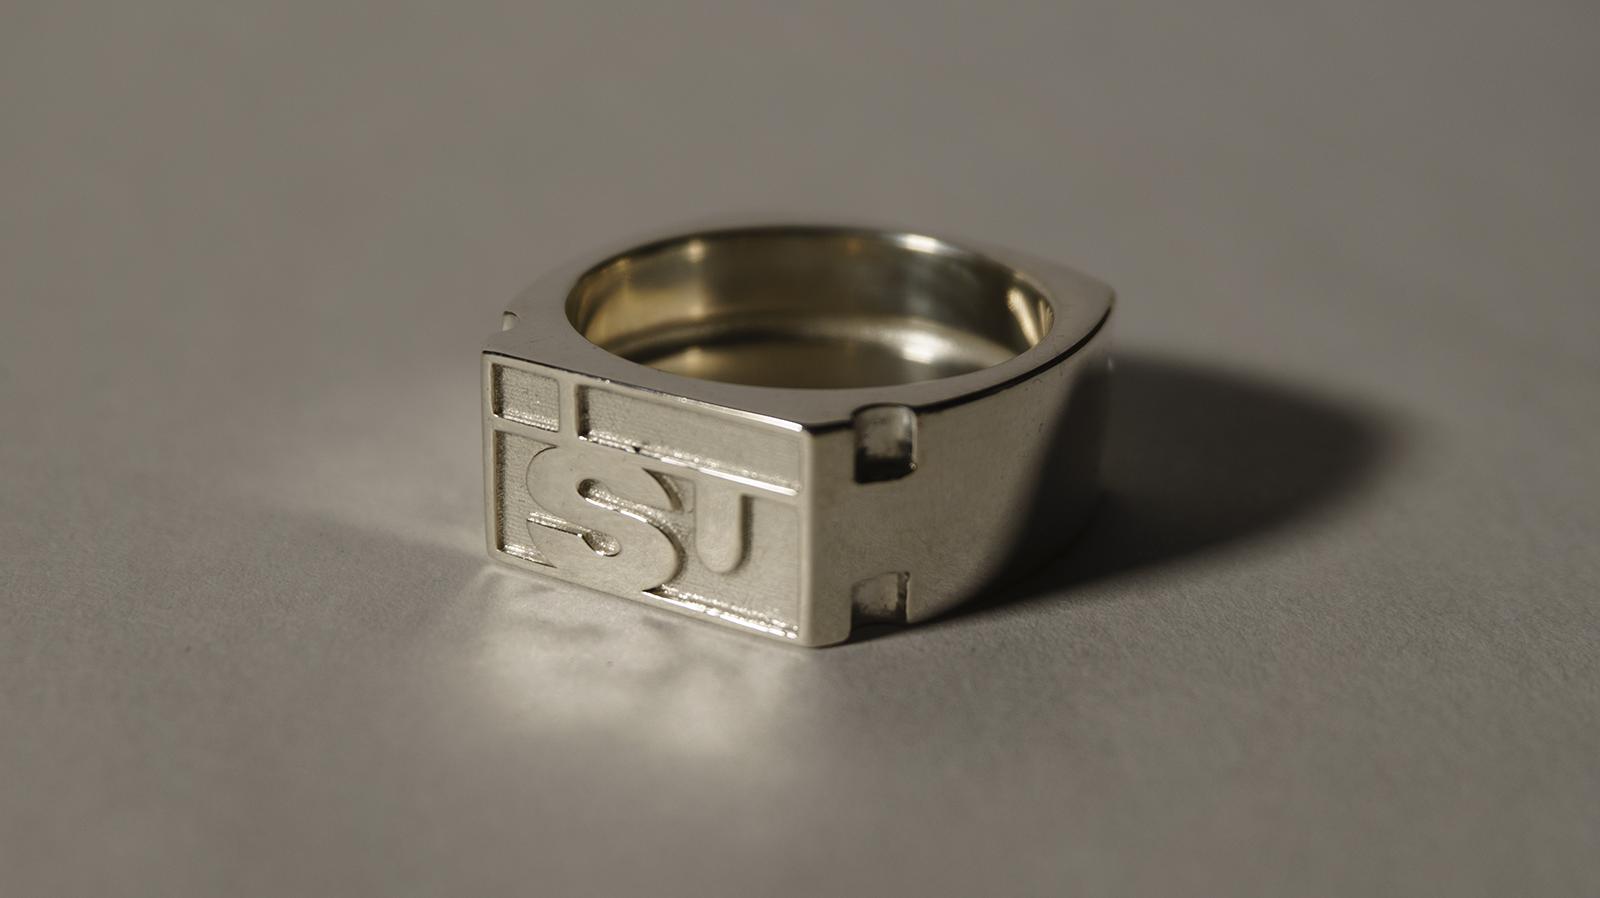 DSC07847_ps1-ISU-silver1a.png